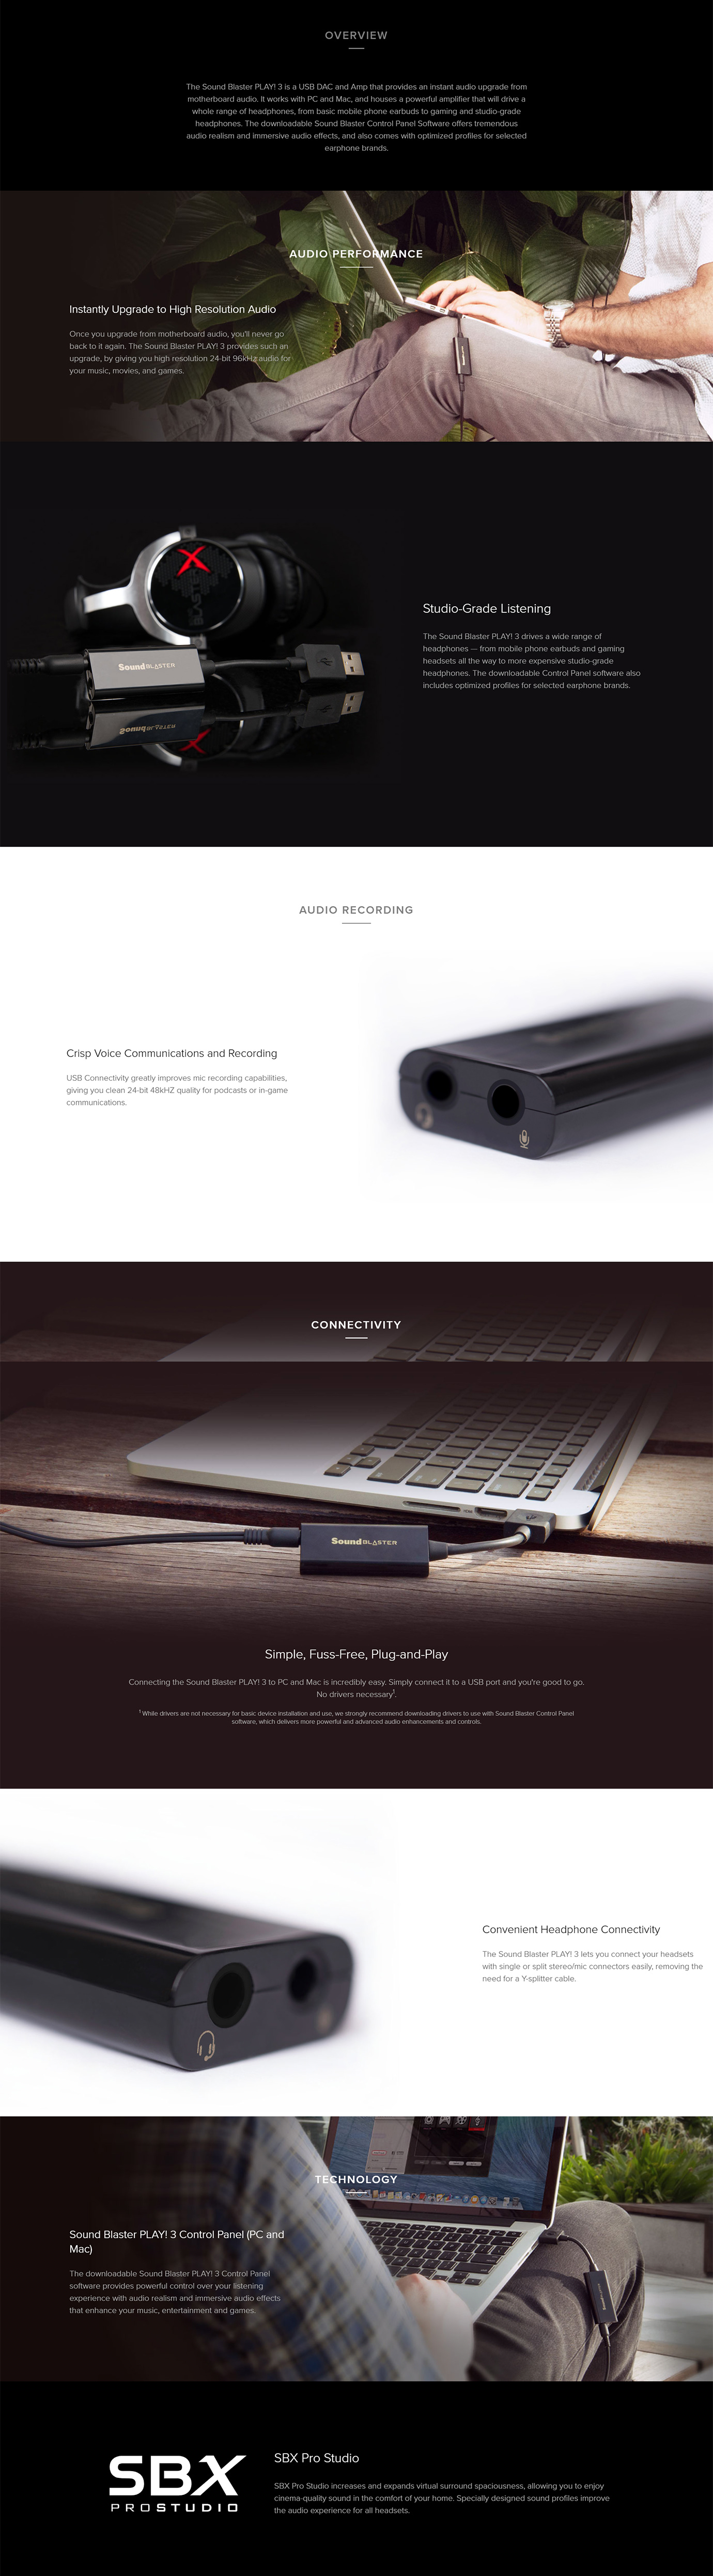 Creative Sound Blaster Play 3 USB DAC Amp and Sound Card